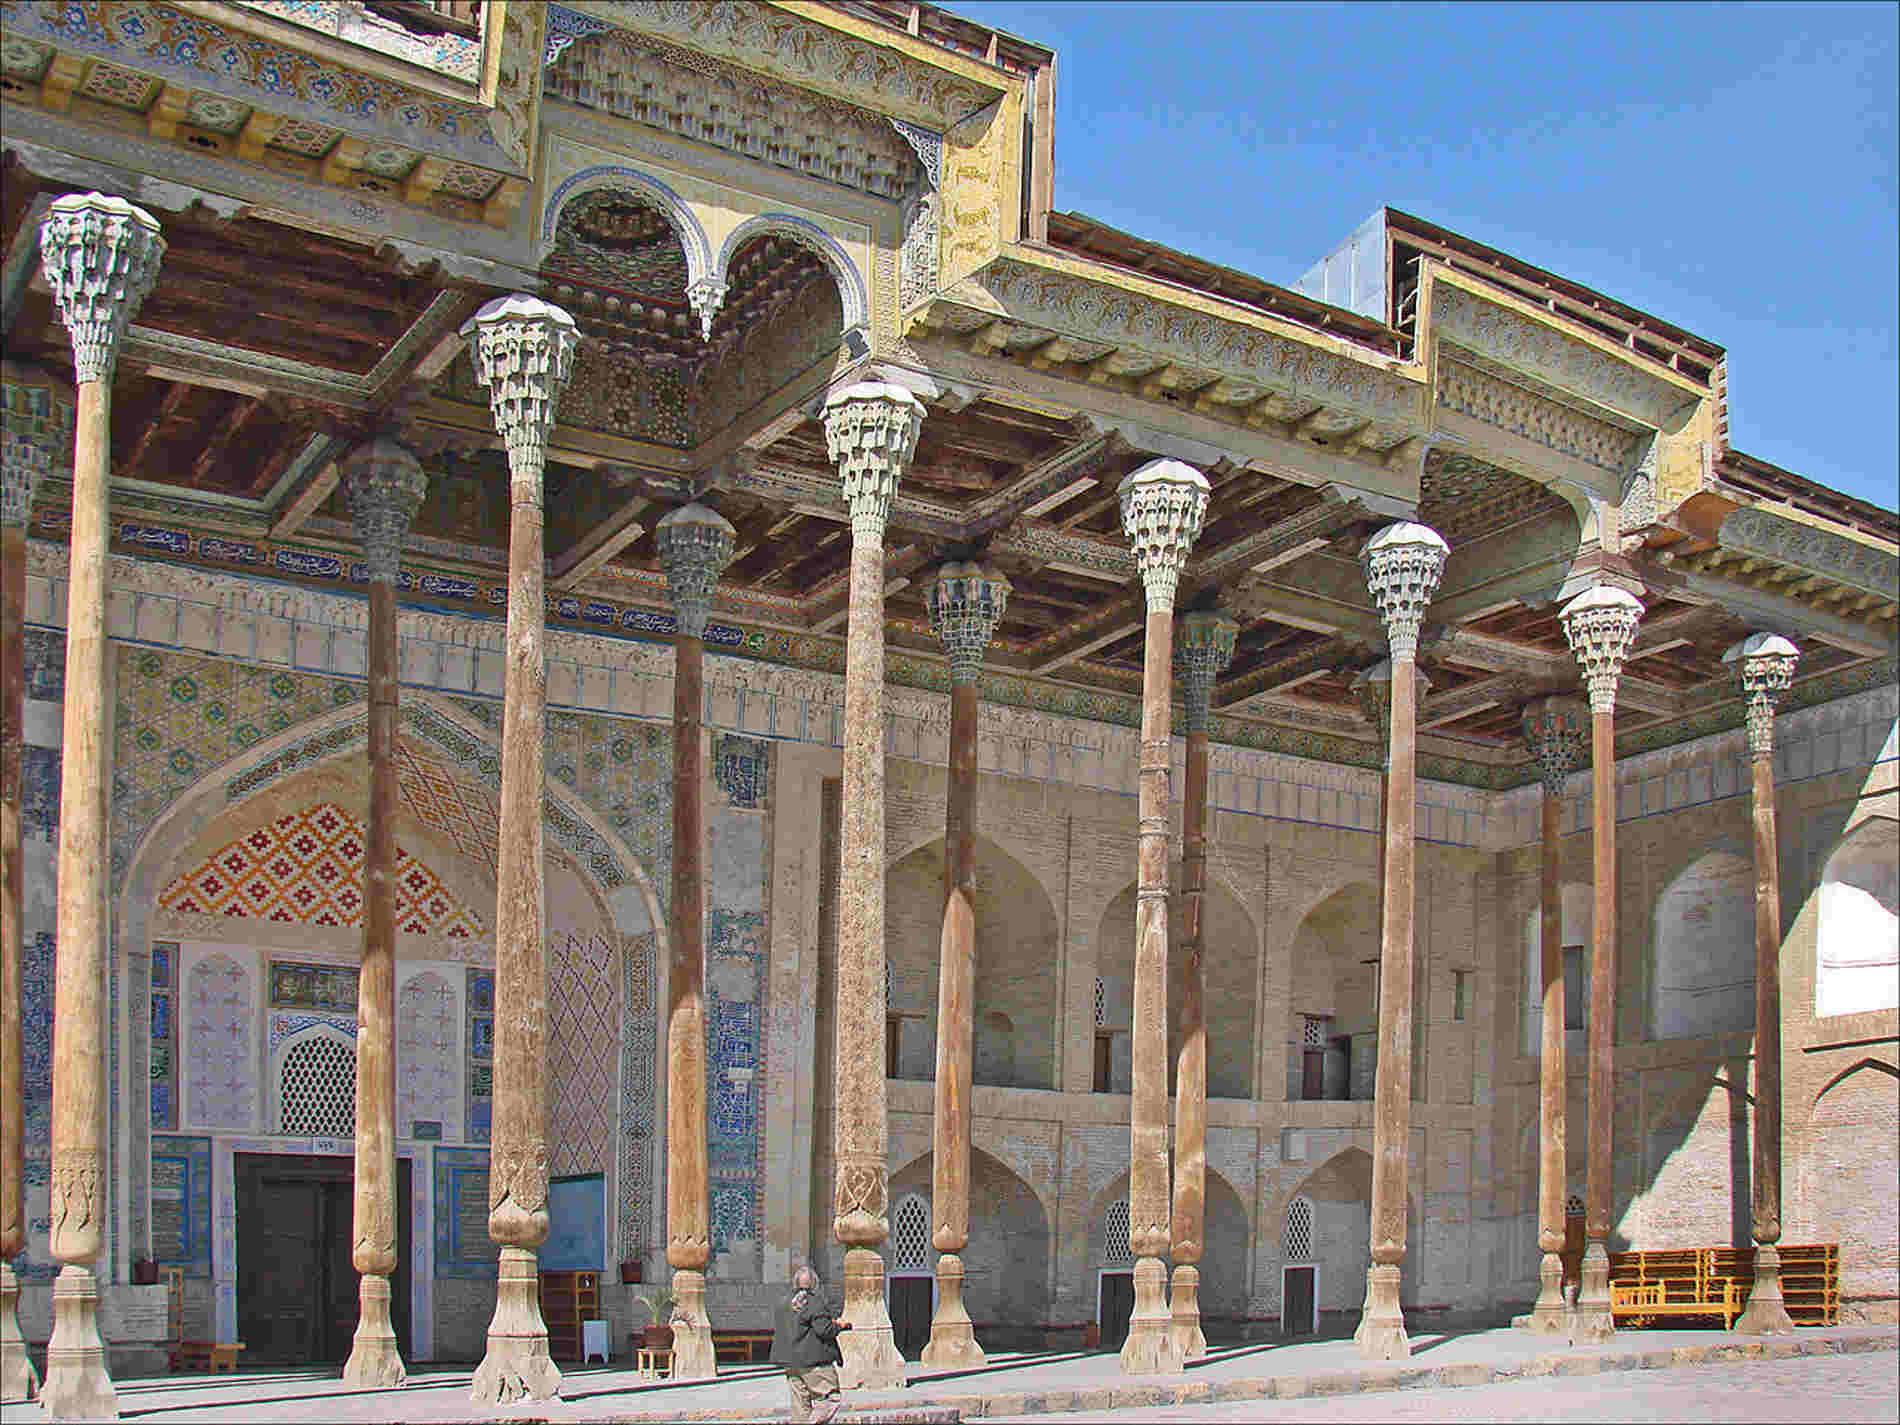 Moschea-Bolo-Khaouz-a Bukhara-tappa-del-tour-inUzbekistan